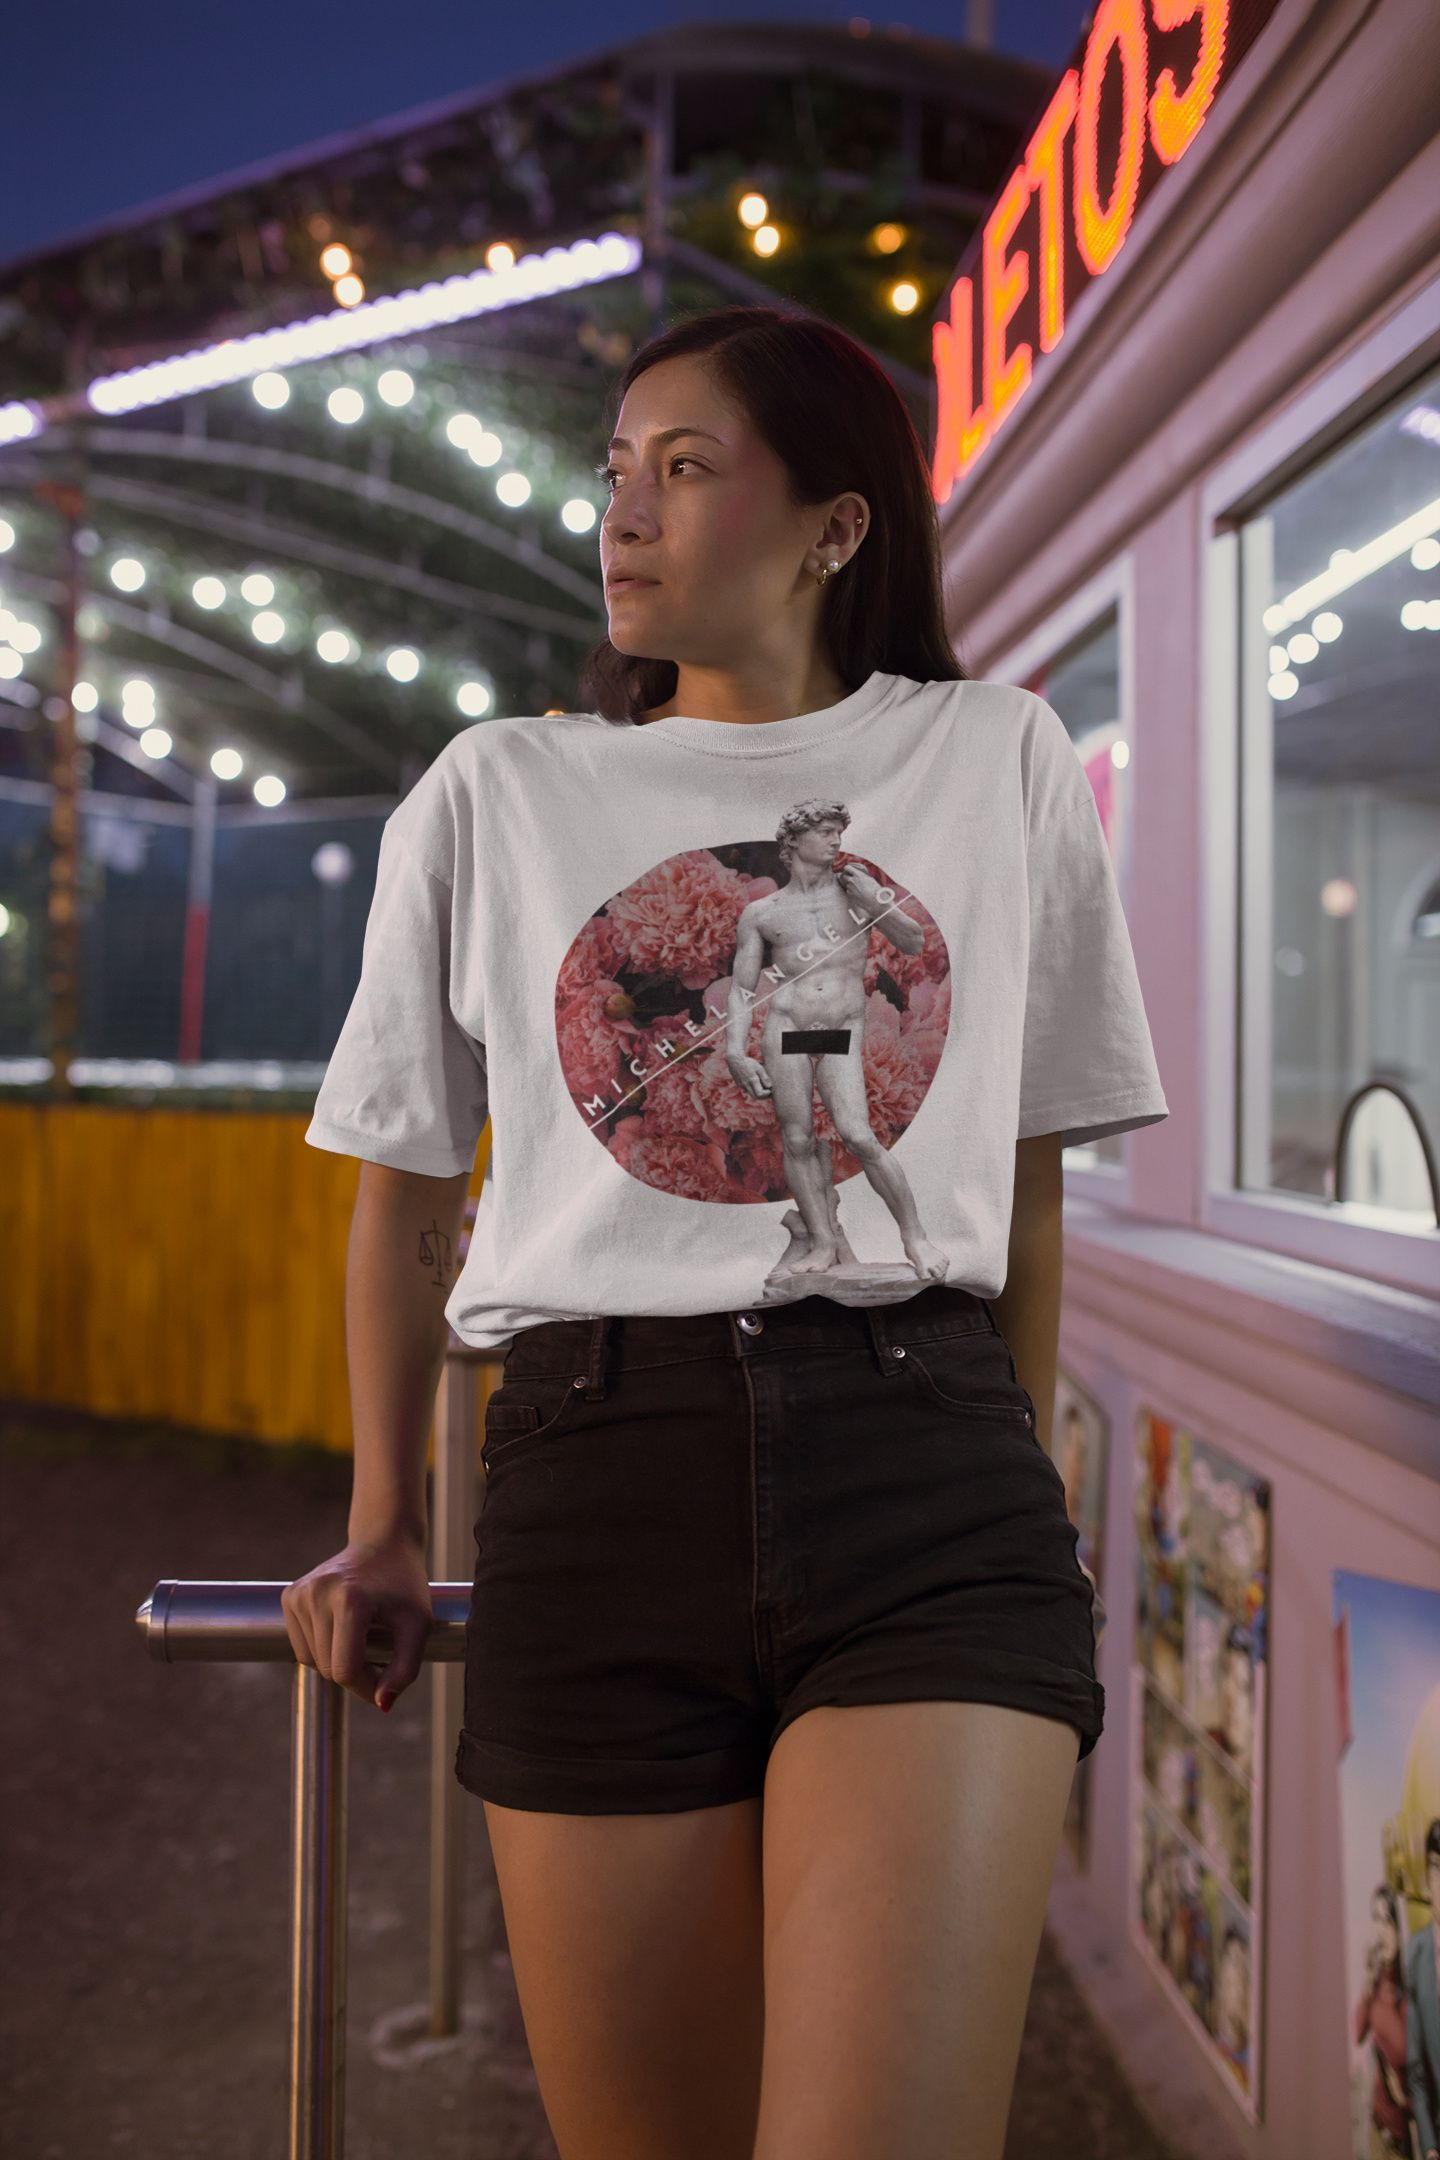 David T-shirt Michelangelo shirt Renaissance Vintage | Etsy